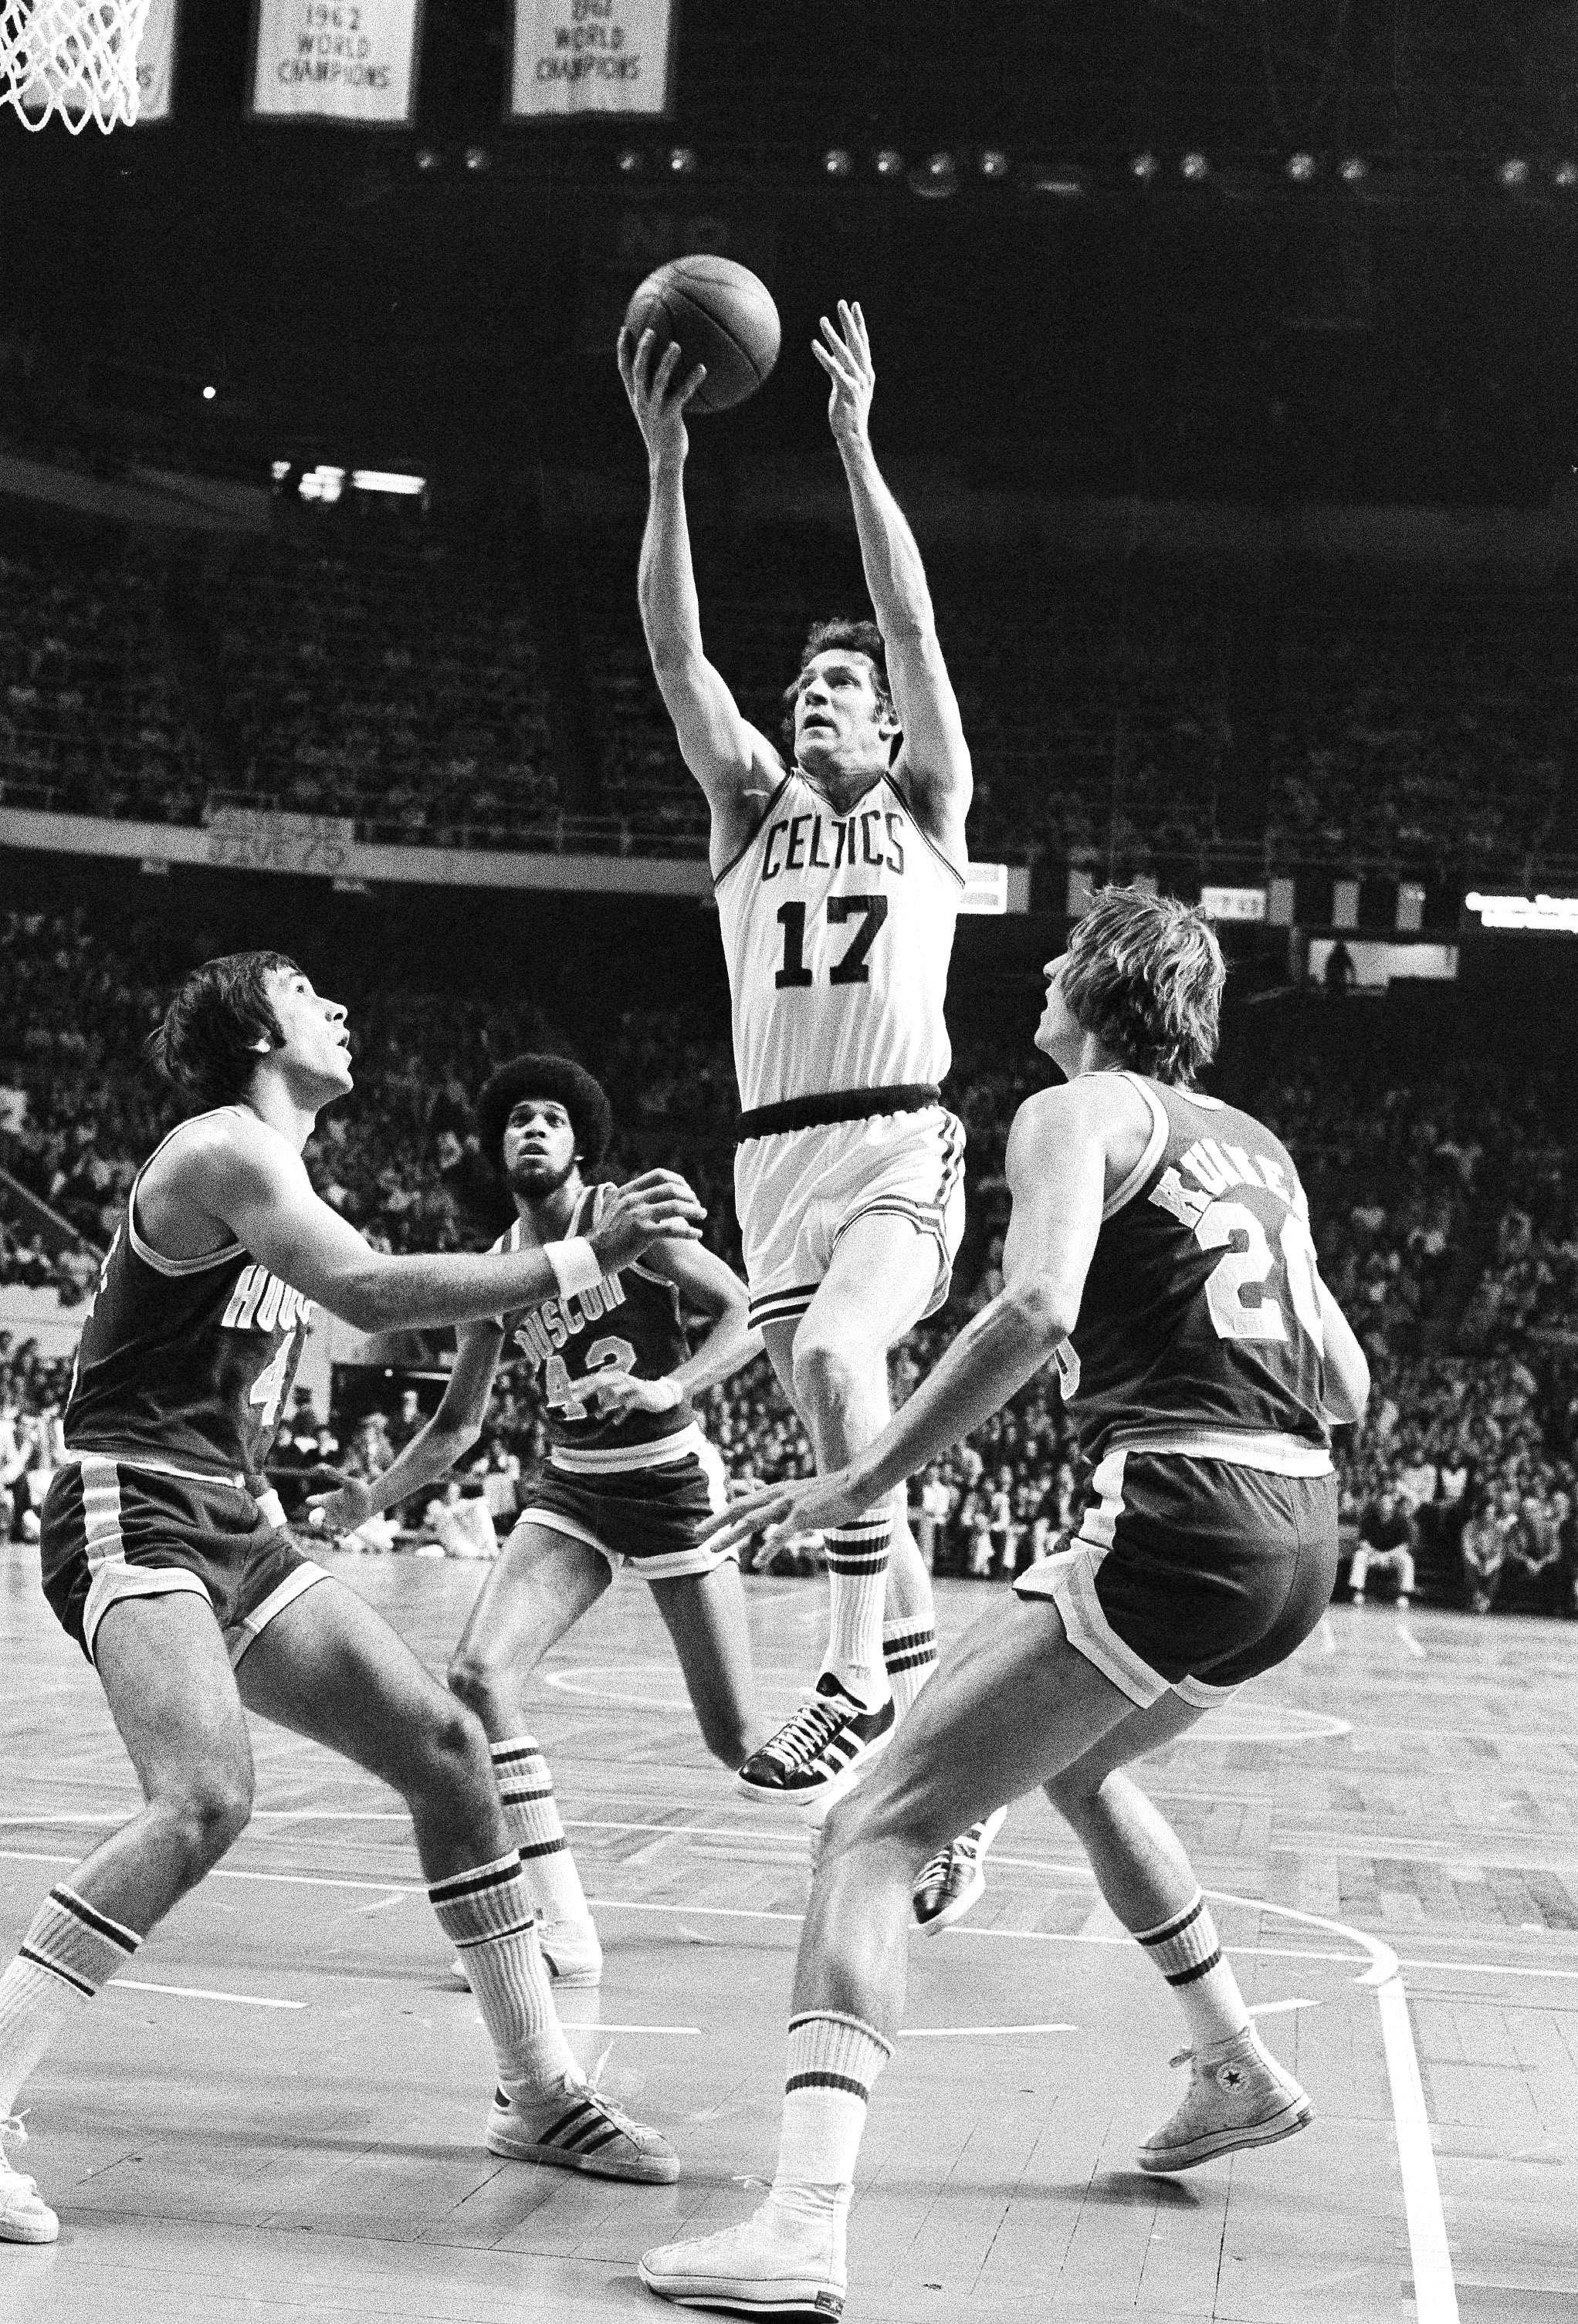 Boston Celtics great John Havlicek dies at age 79